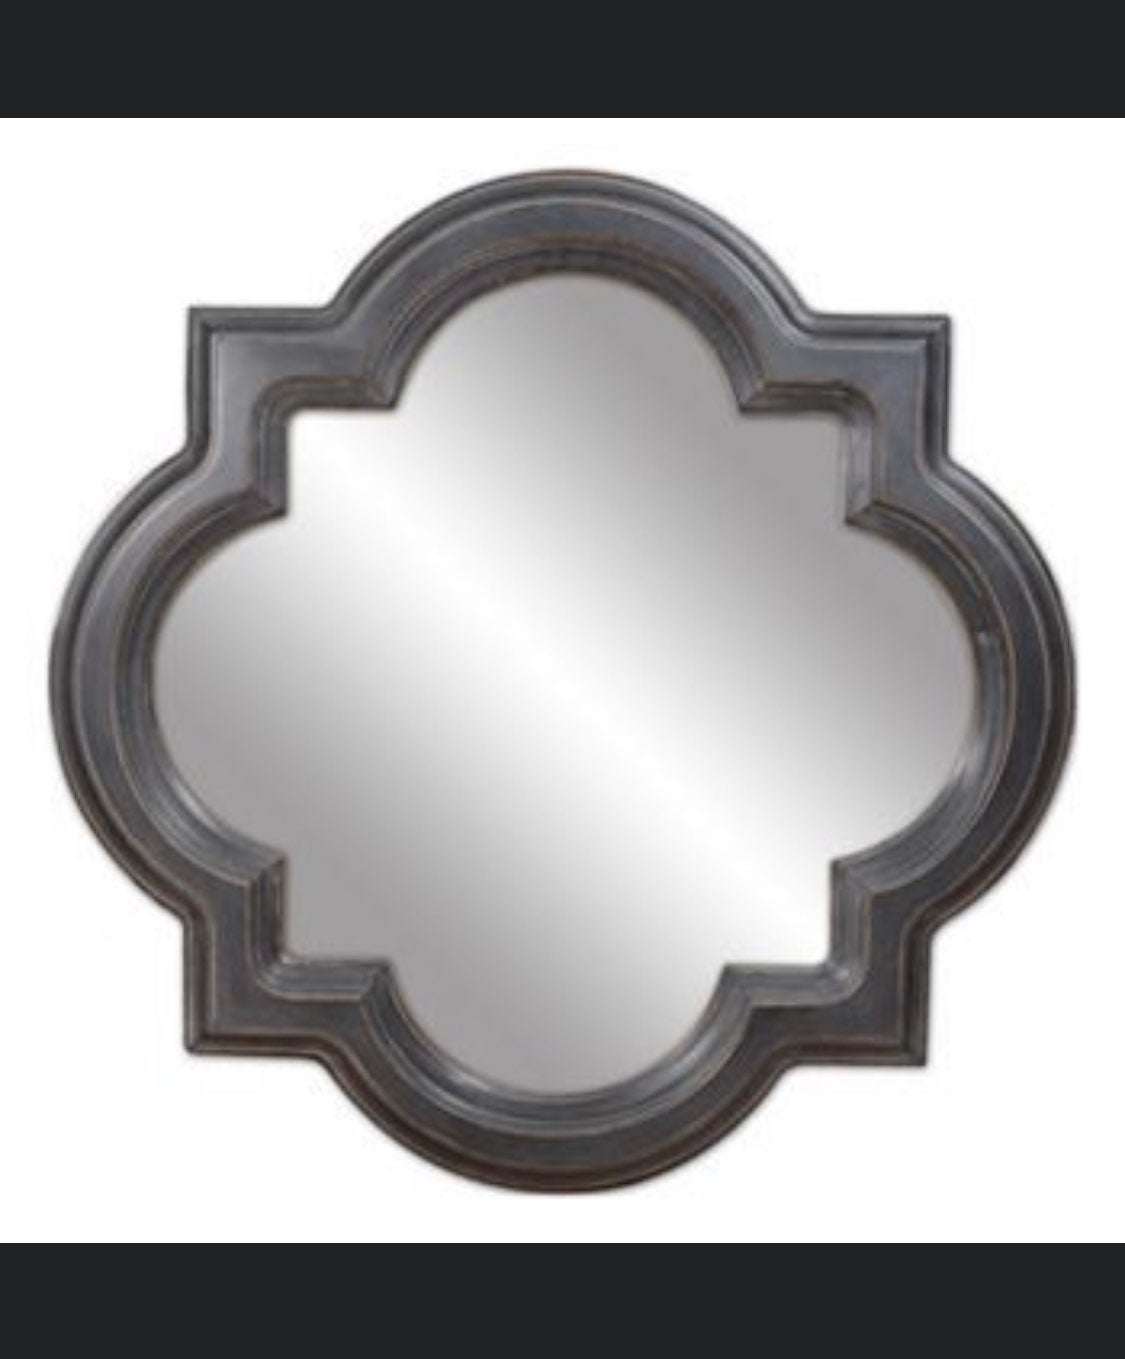 Home Decor - Wall Mirror(s)